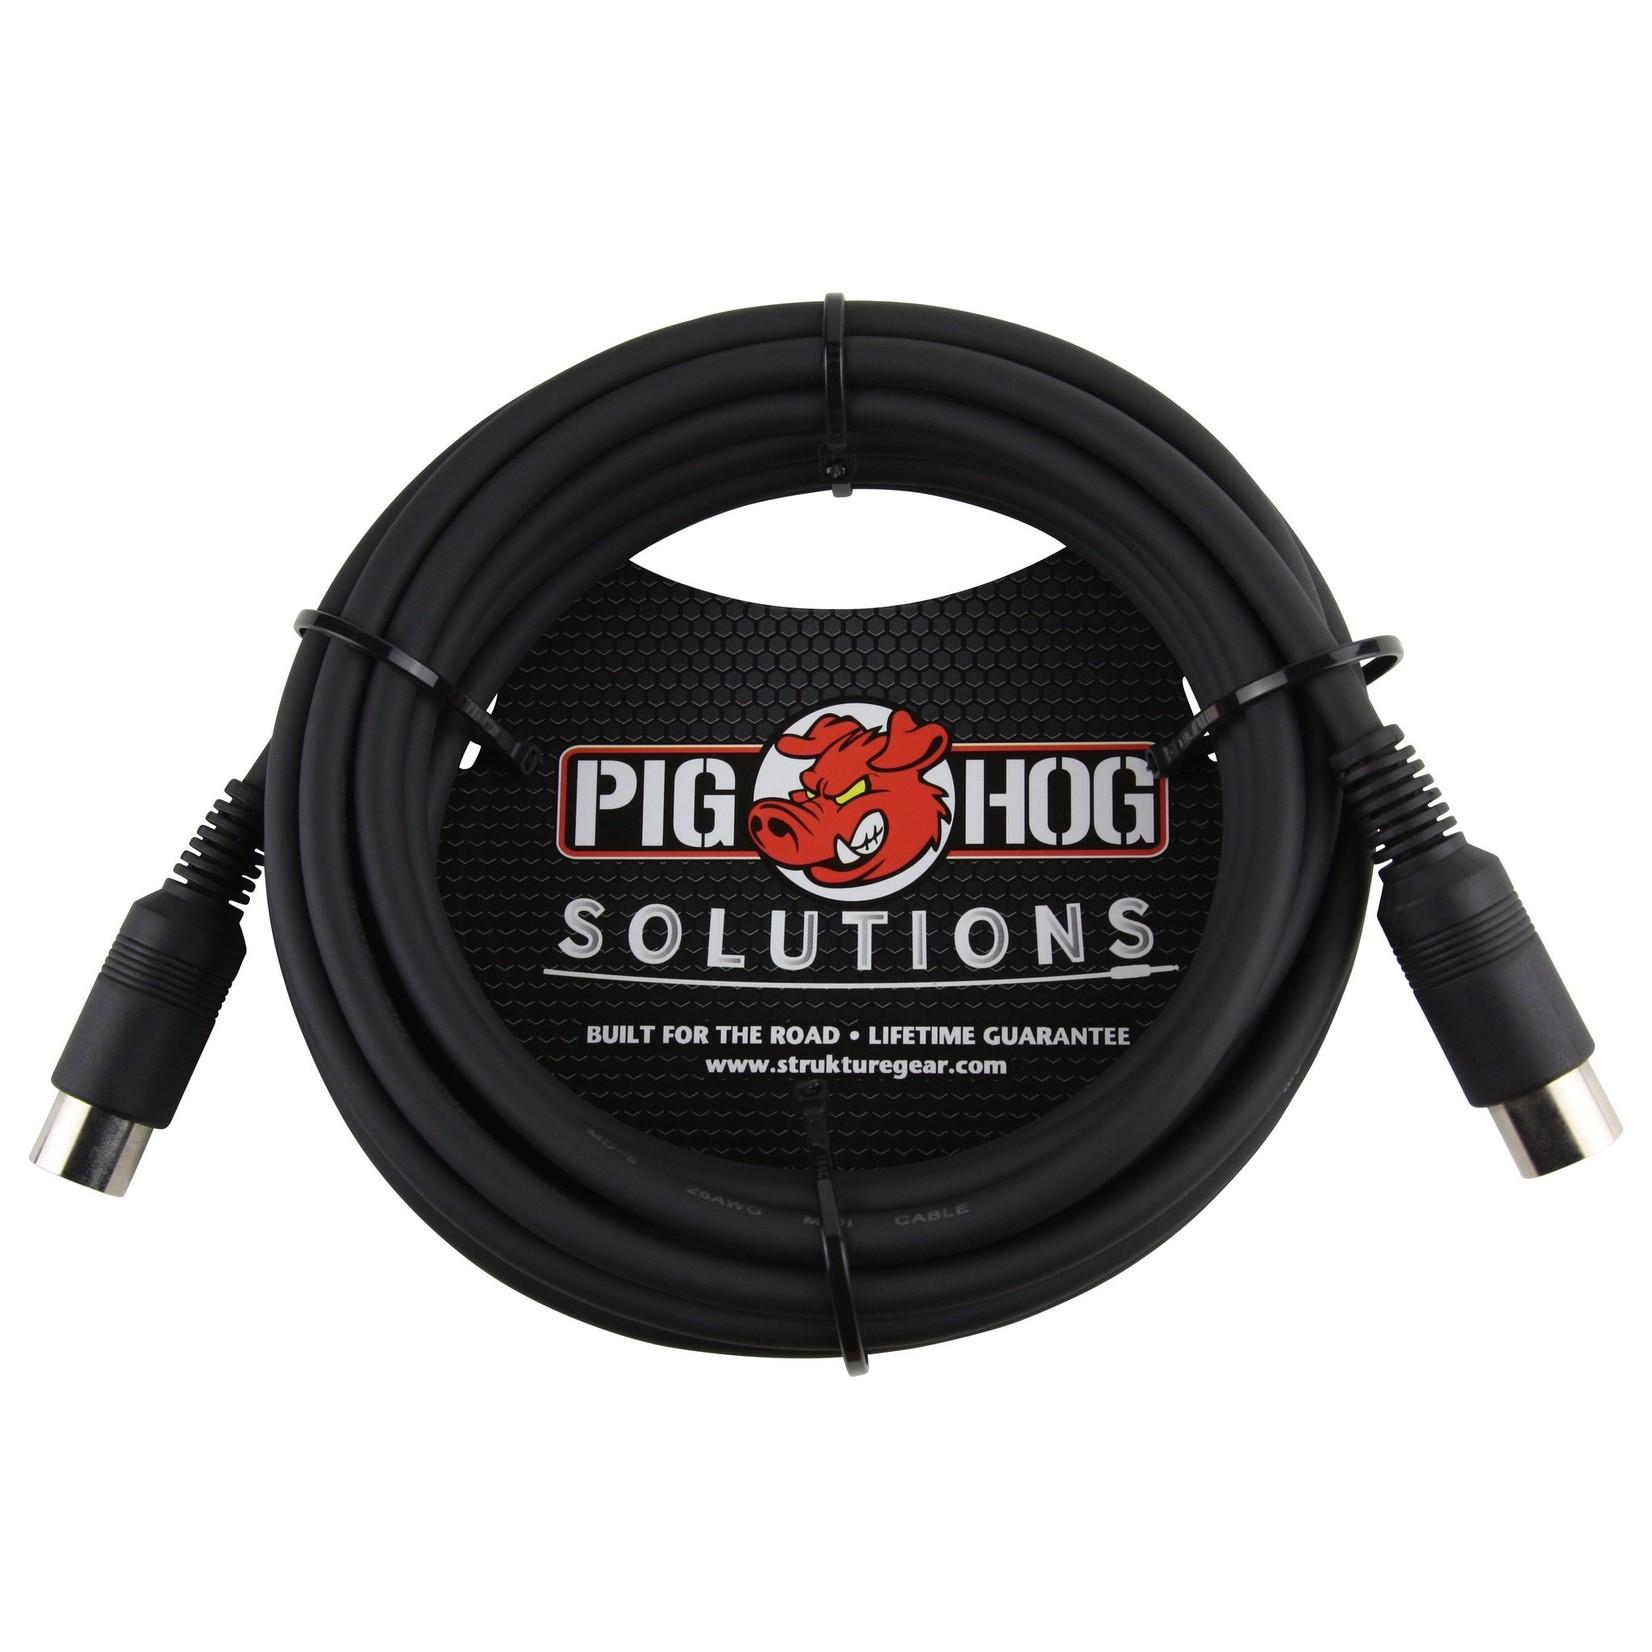 Pig Hog Pig Hog 15-Foot Tour Grade MIDI Cable, Heavy Duty